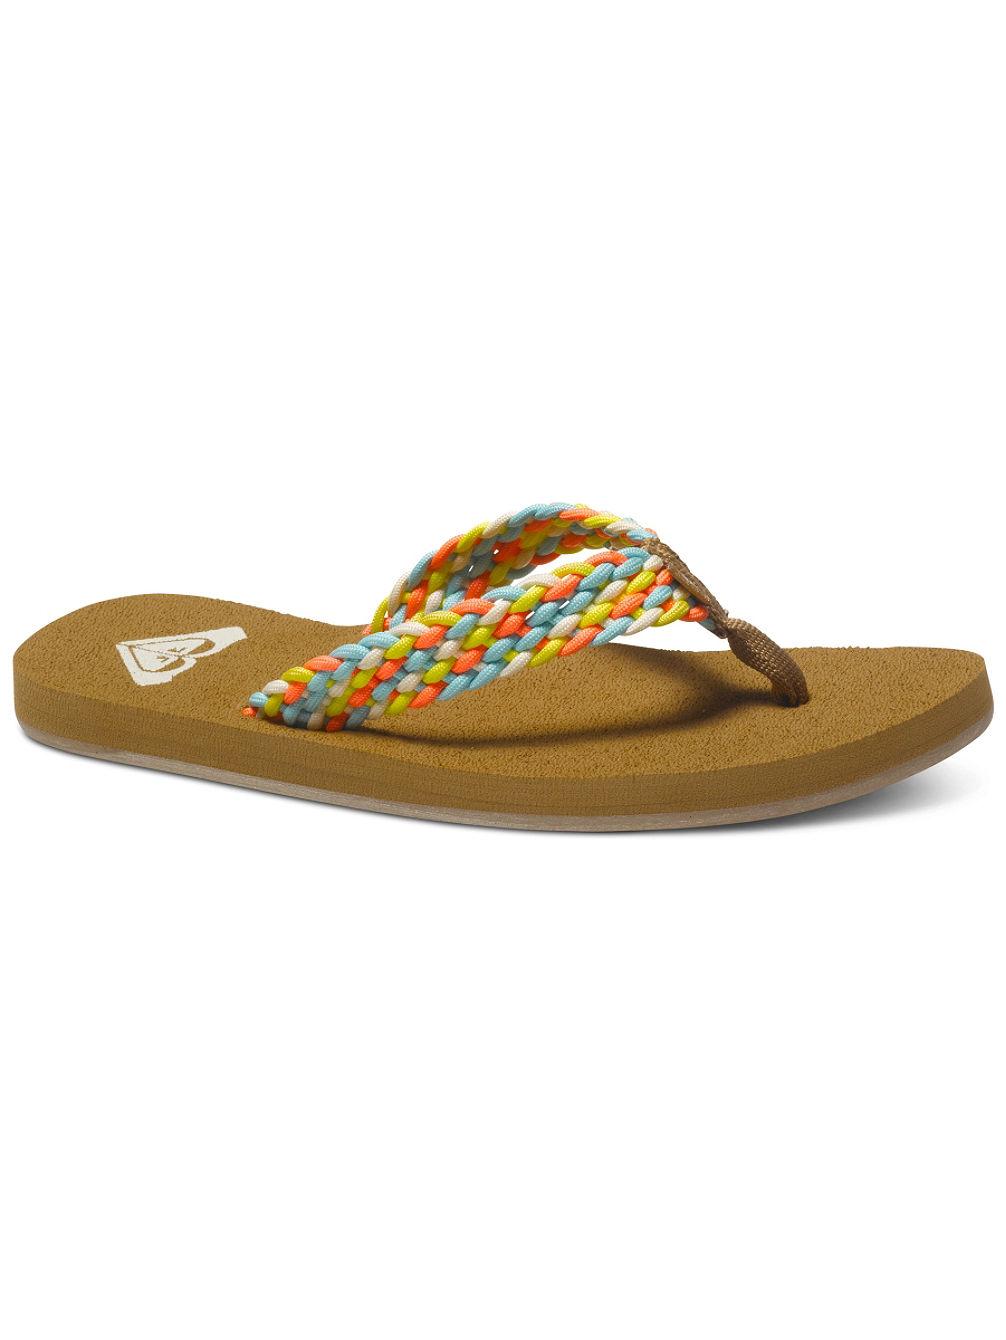 porto-sandals-women